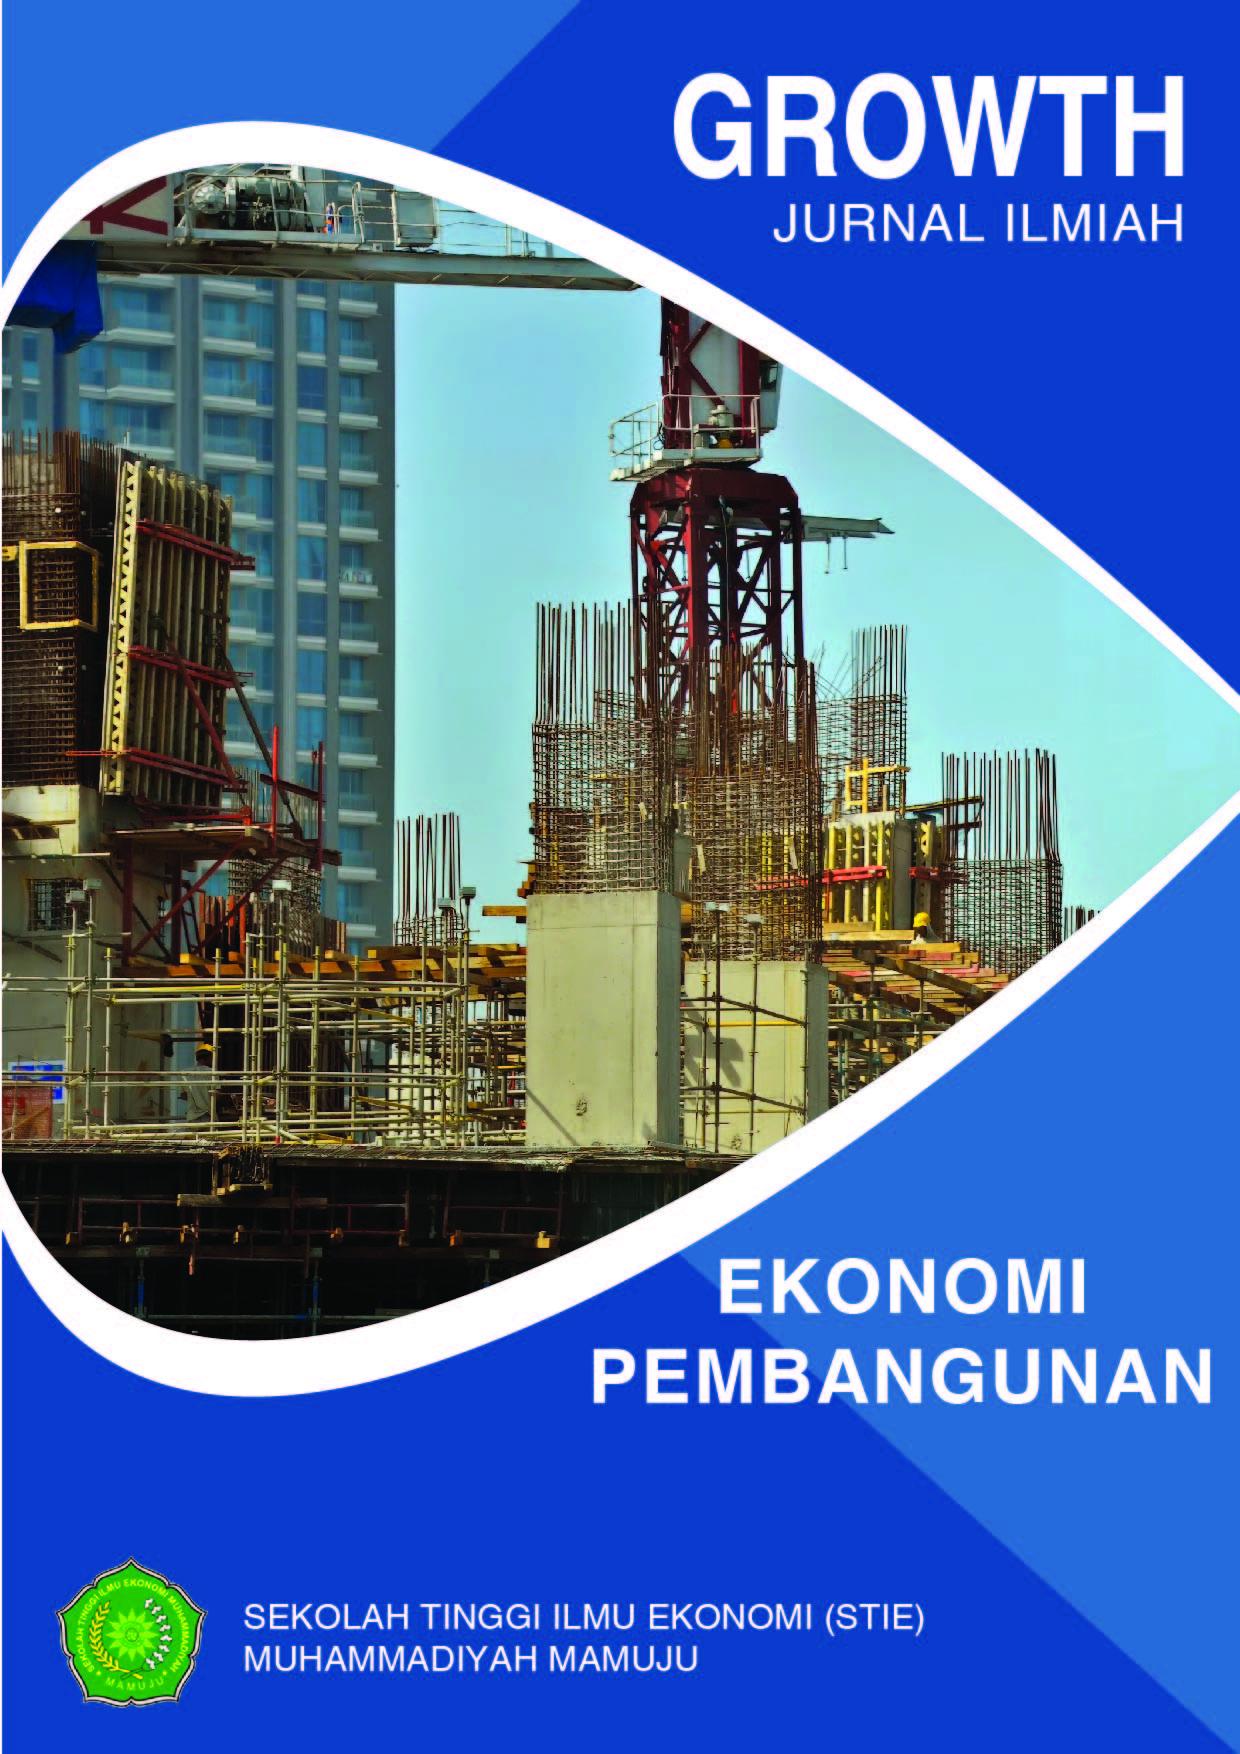 Peranan Sektor Pertanian Dalam Perencanaan Pembangunan Ekonomi Di Kecamatan Galang Kabupaten Tolitoli Growth Jurnal Ilmiah Ekonomi Pembangunan